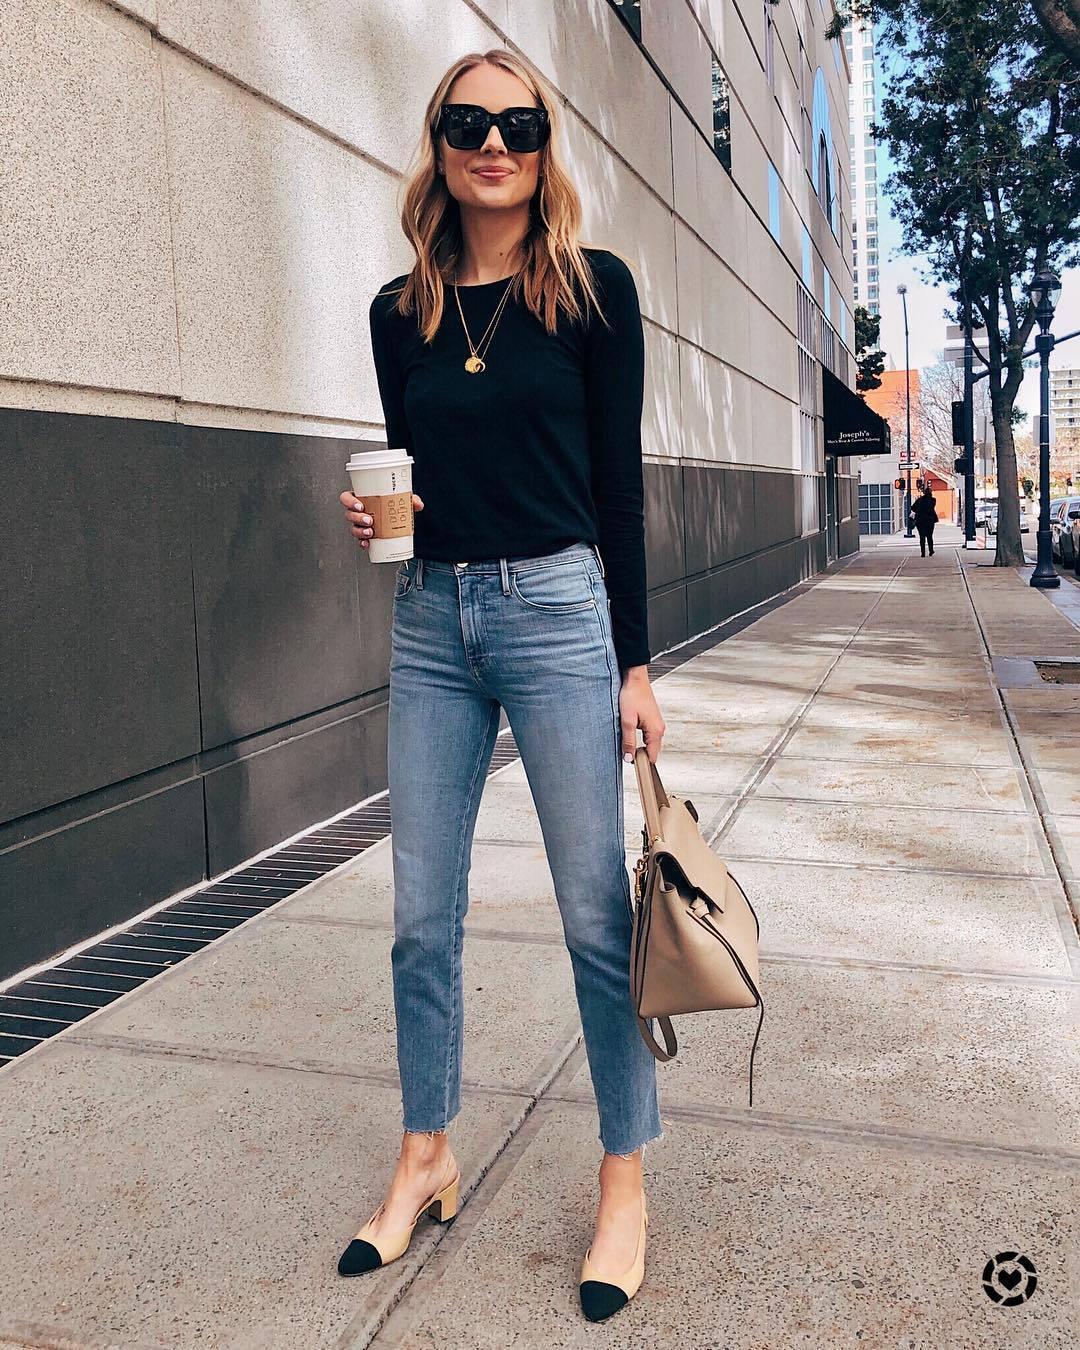 jeans high waisted jeans cropped jeans slingbacks shoulder bag black sweater black sunglasses